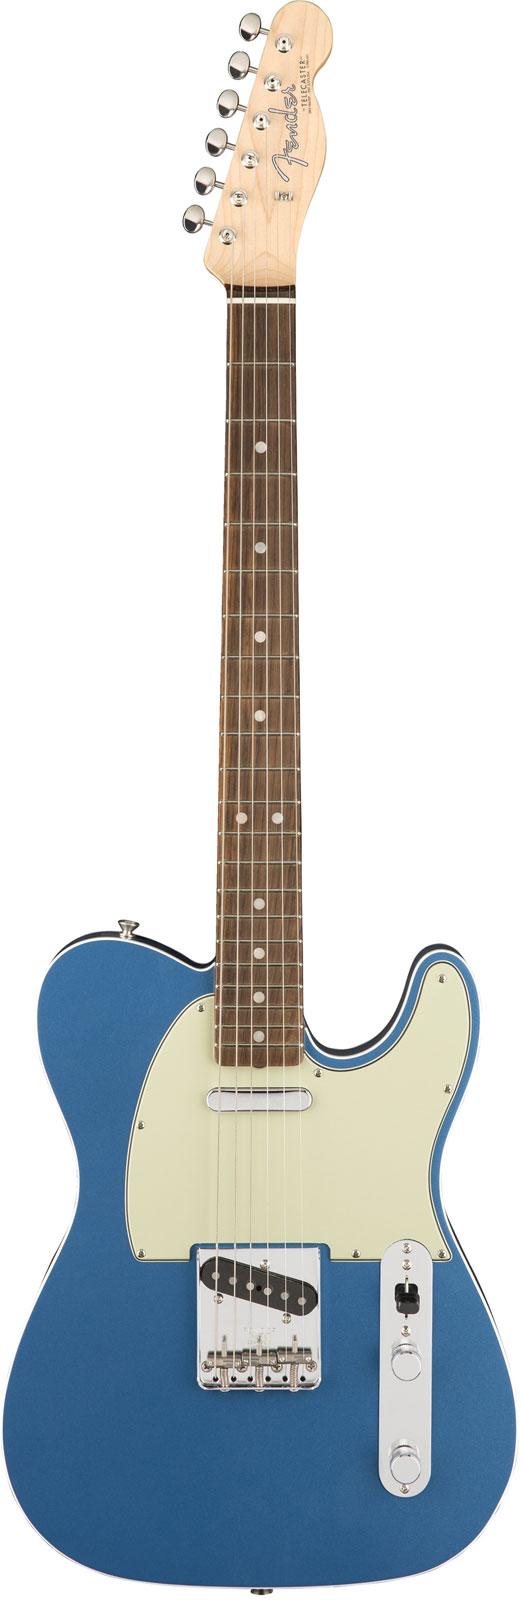 Fender American Original 60s Telecaster Rw Lake Placid Blue